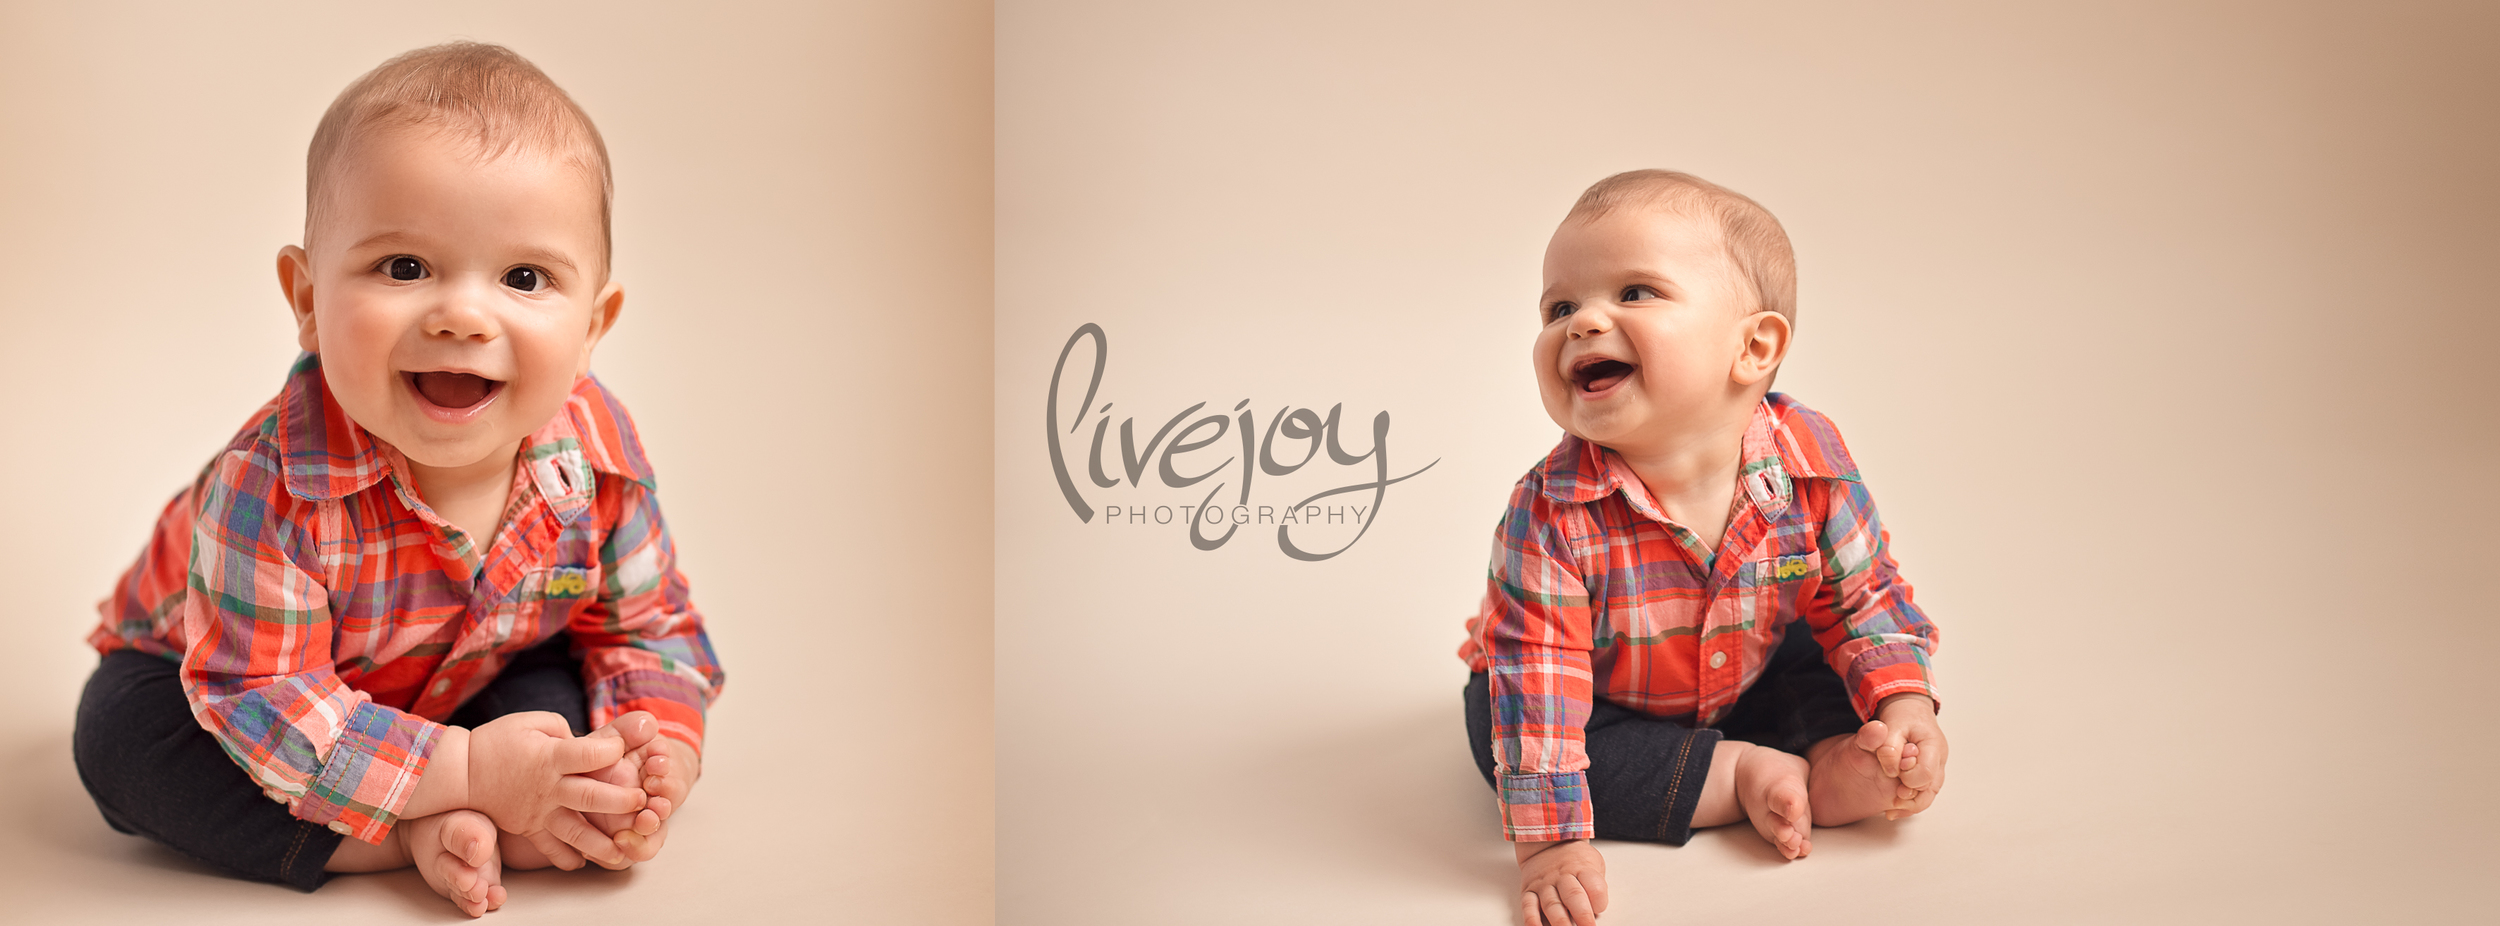 6 Month Photography   LiveJoy Photography   Oregon